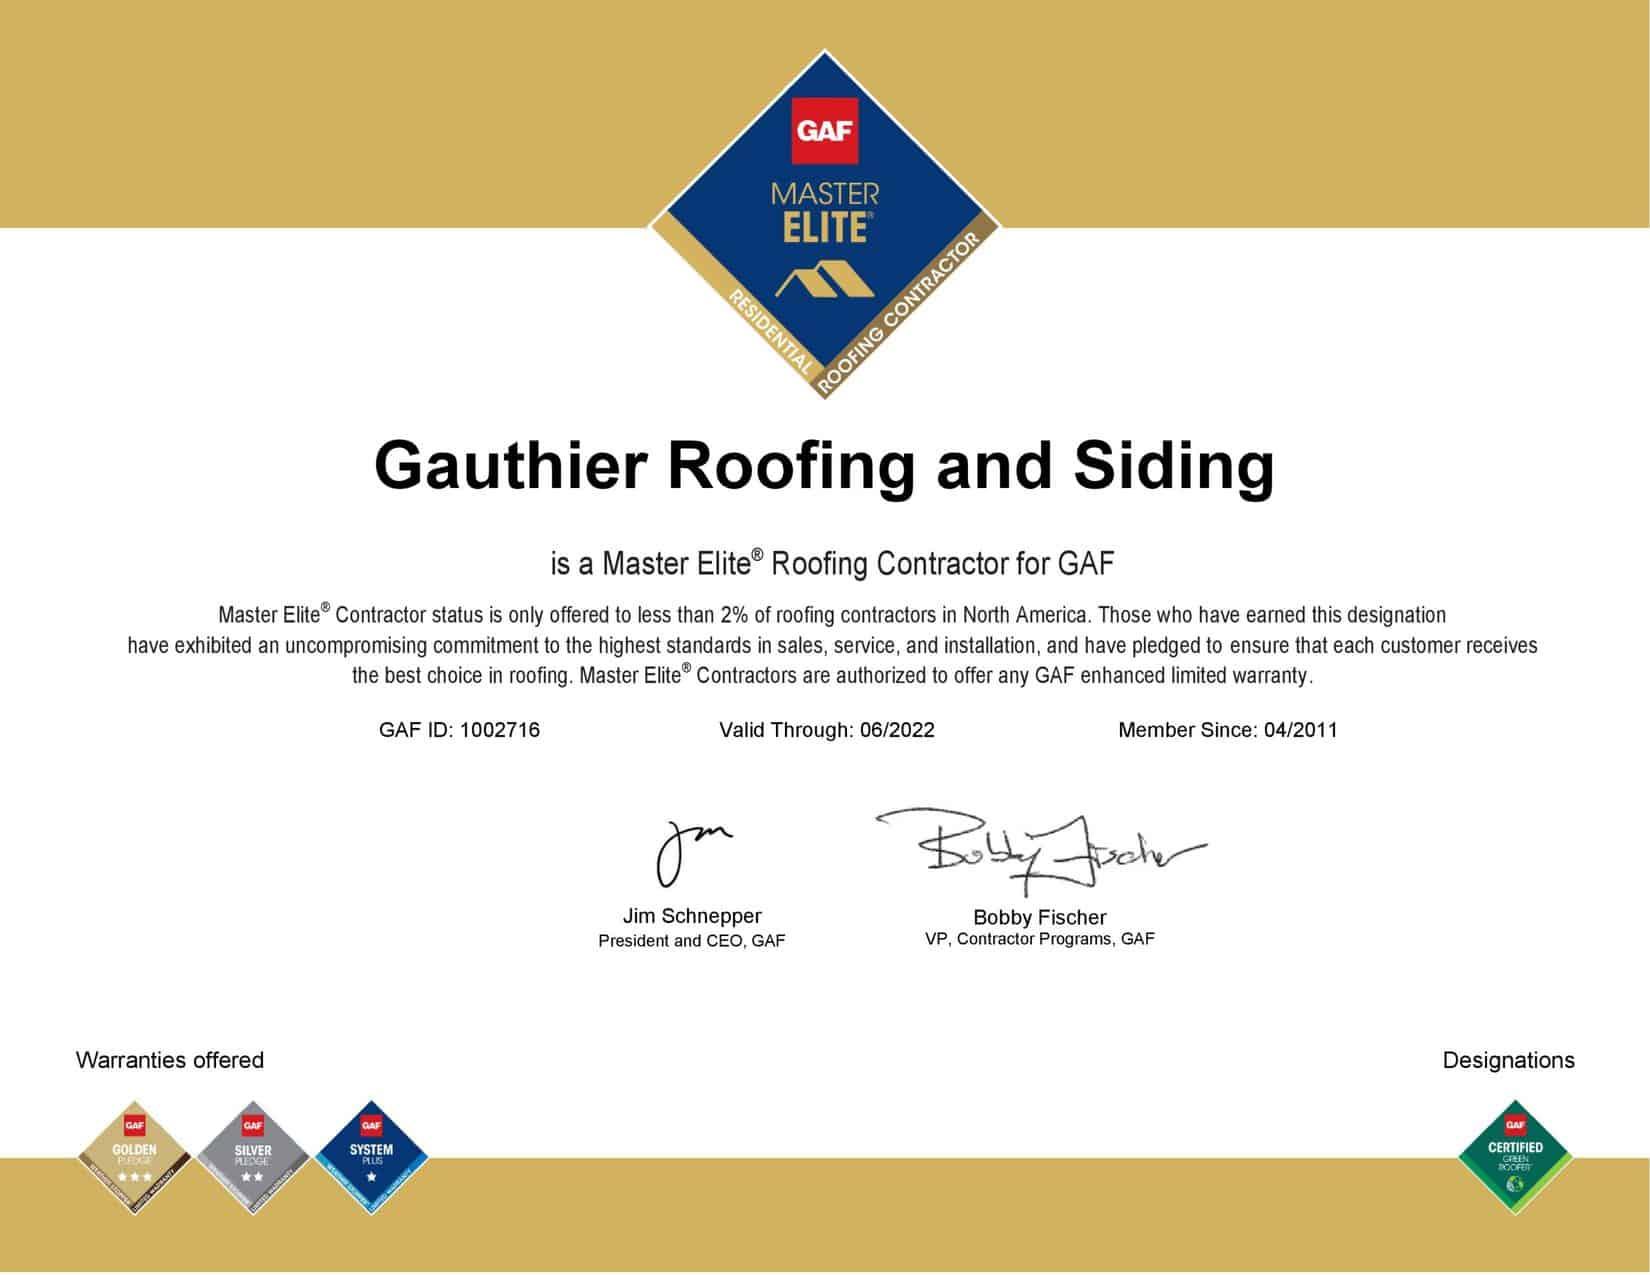 Gauthier Roofing and Siding GAF Master Elite Certificat